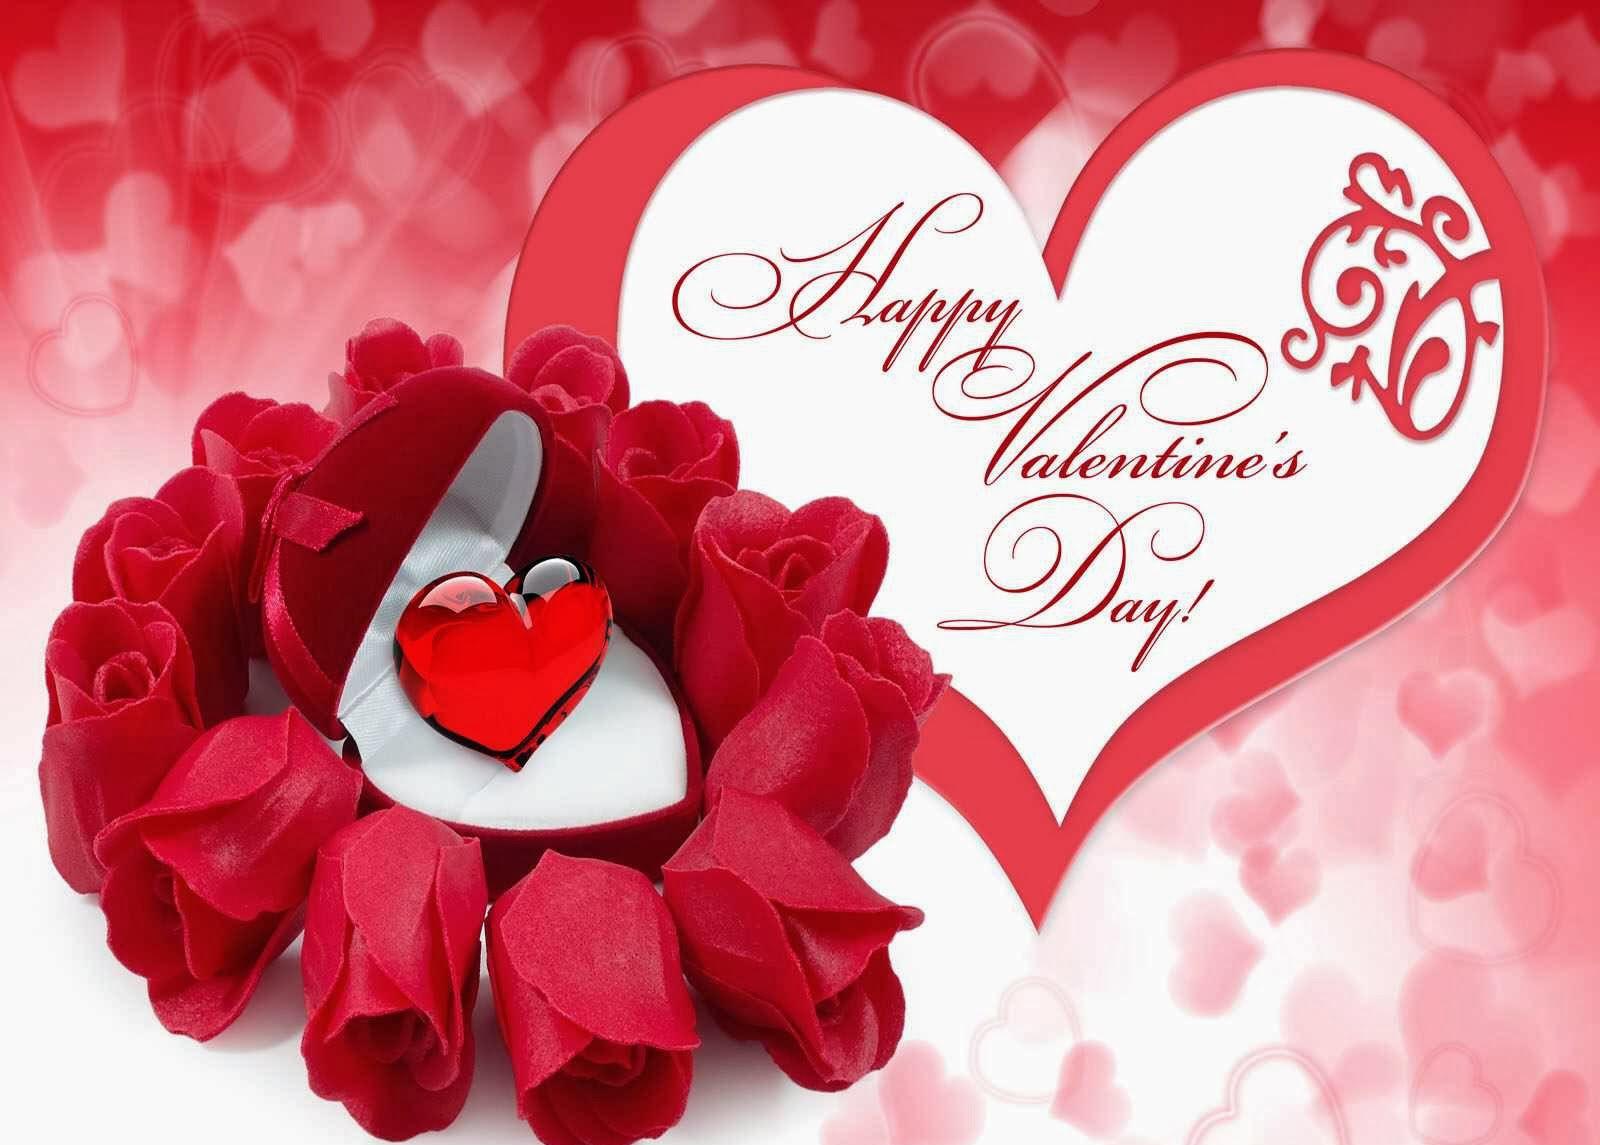 Ảnh thiệp valentine đẹp